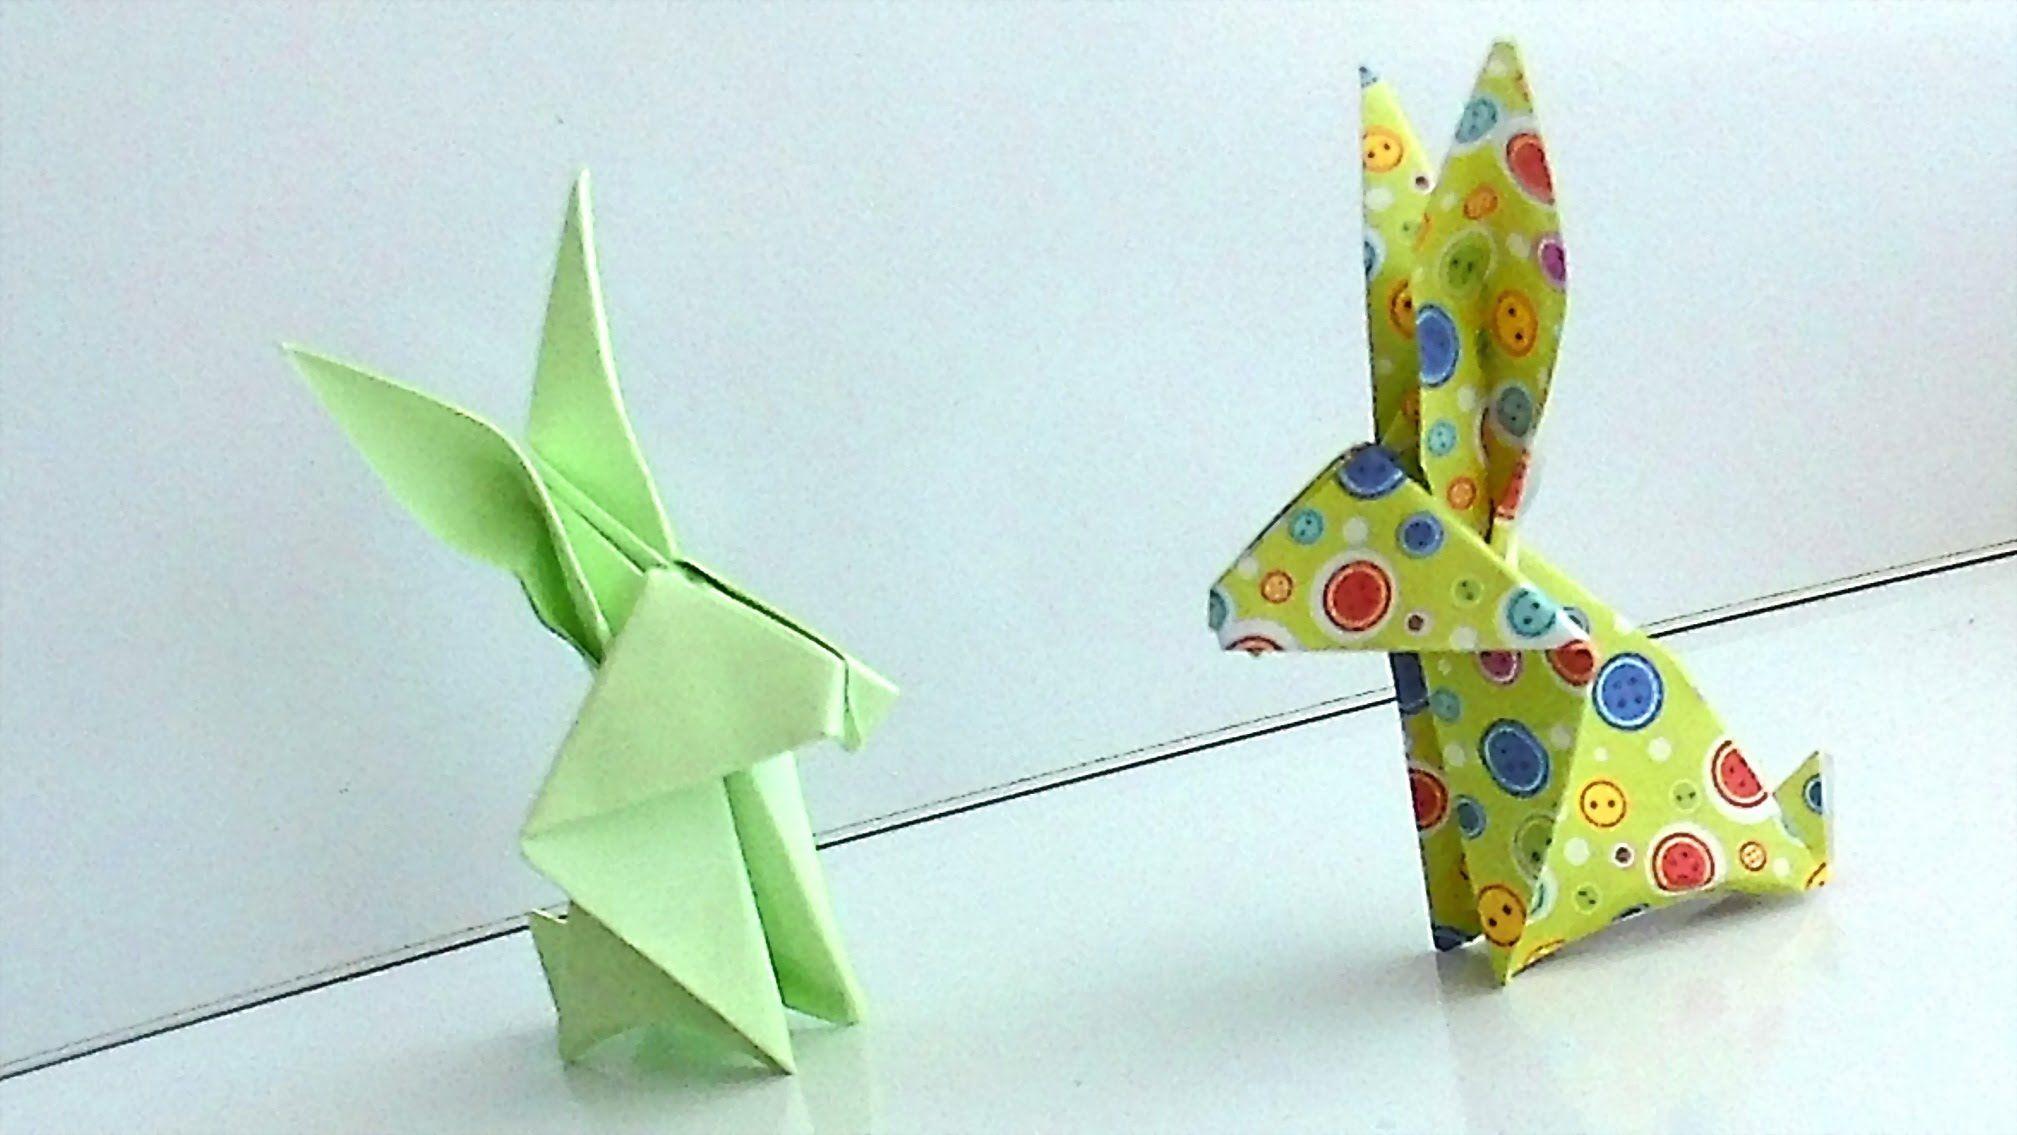 How to make origami animals: Dinosaur/paper dinosaur making ... | 1135x2017